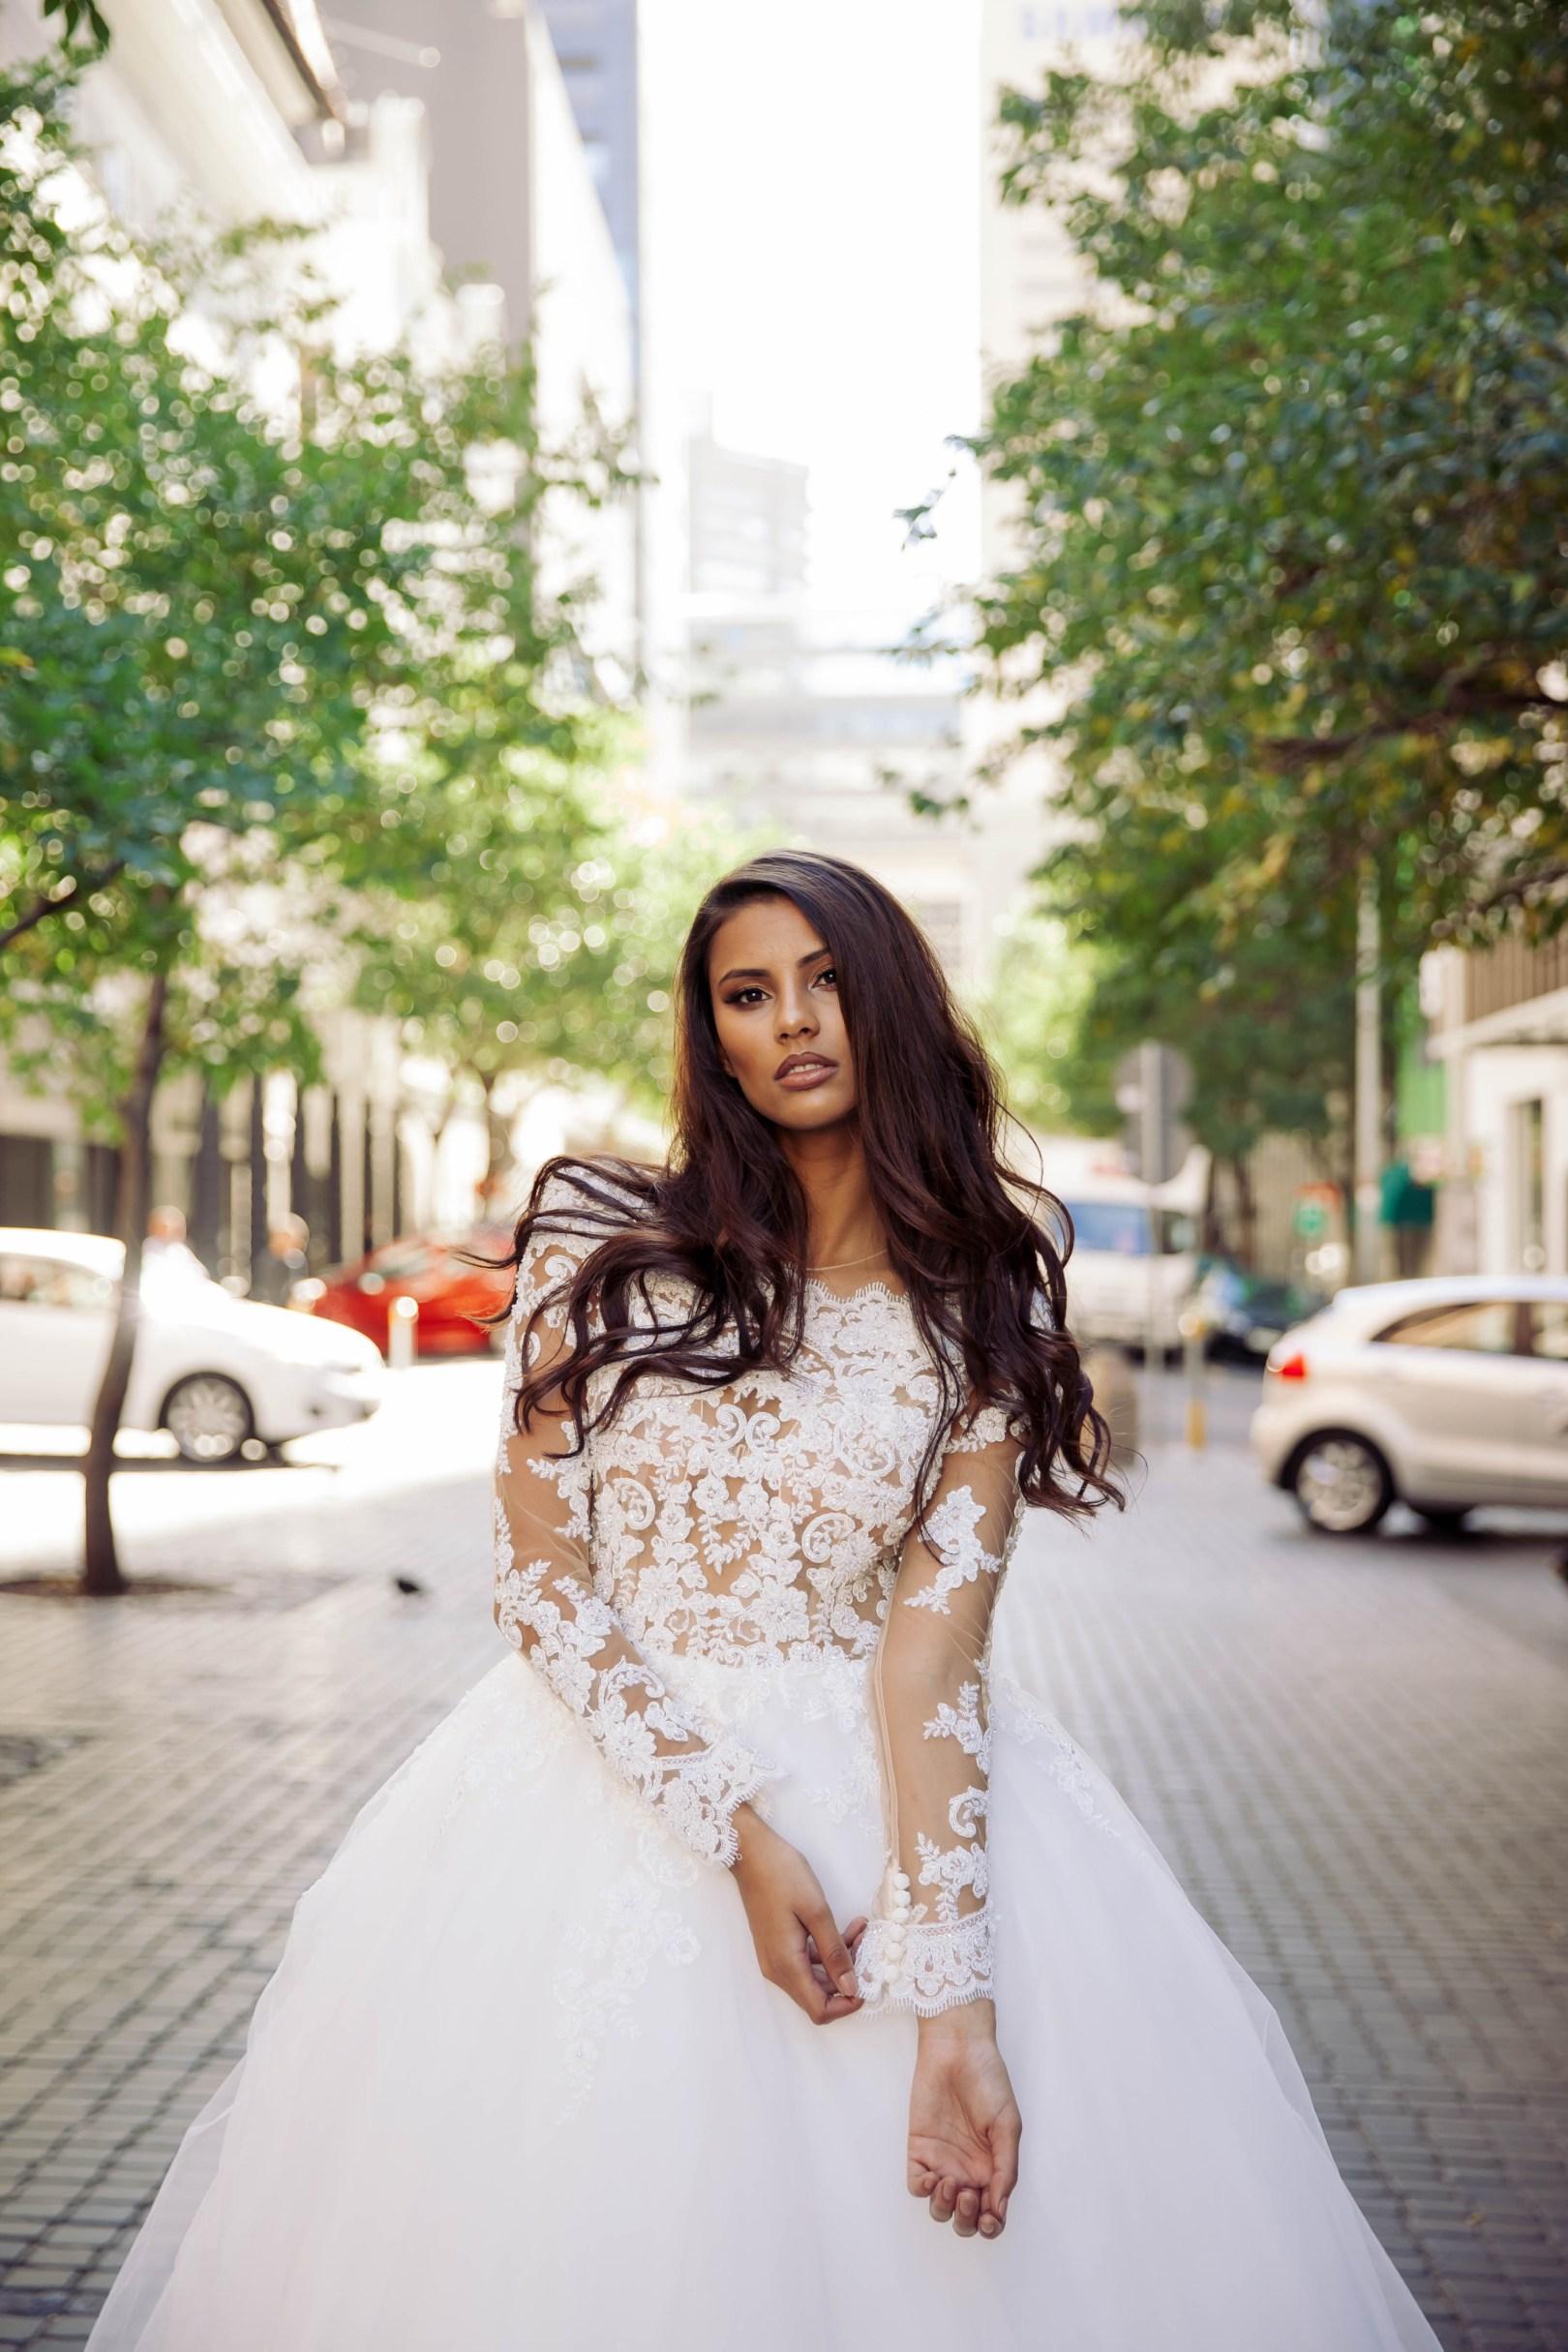 Tashreeqah Sadien Bridal Couture | SheerEverAfter.com - Your online Maid of Honor